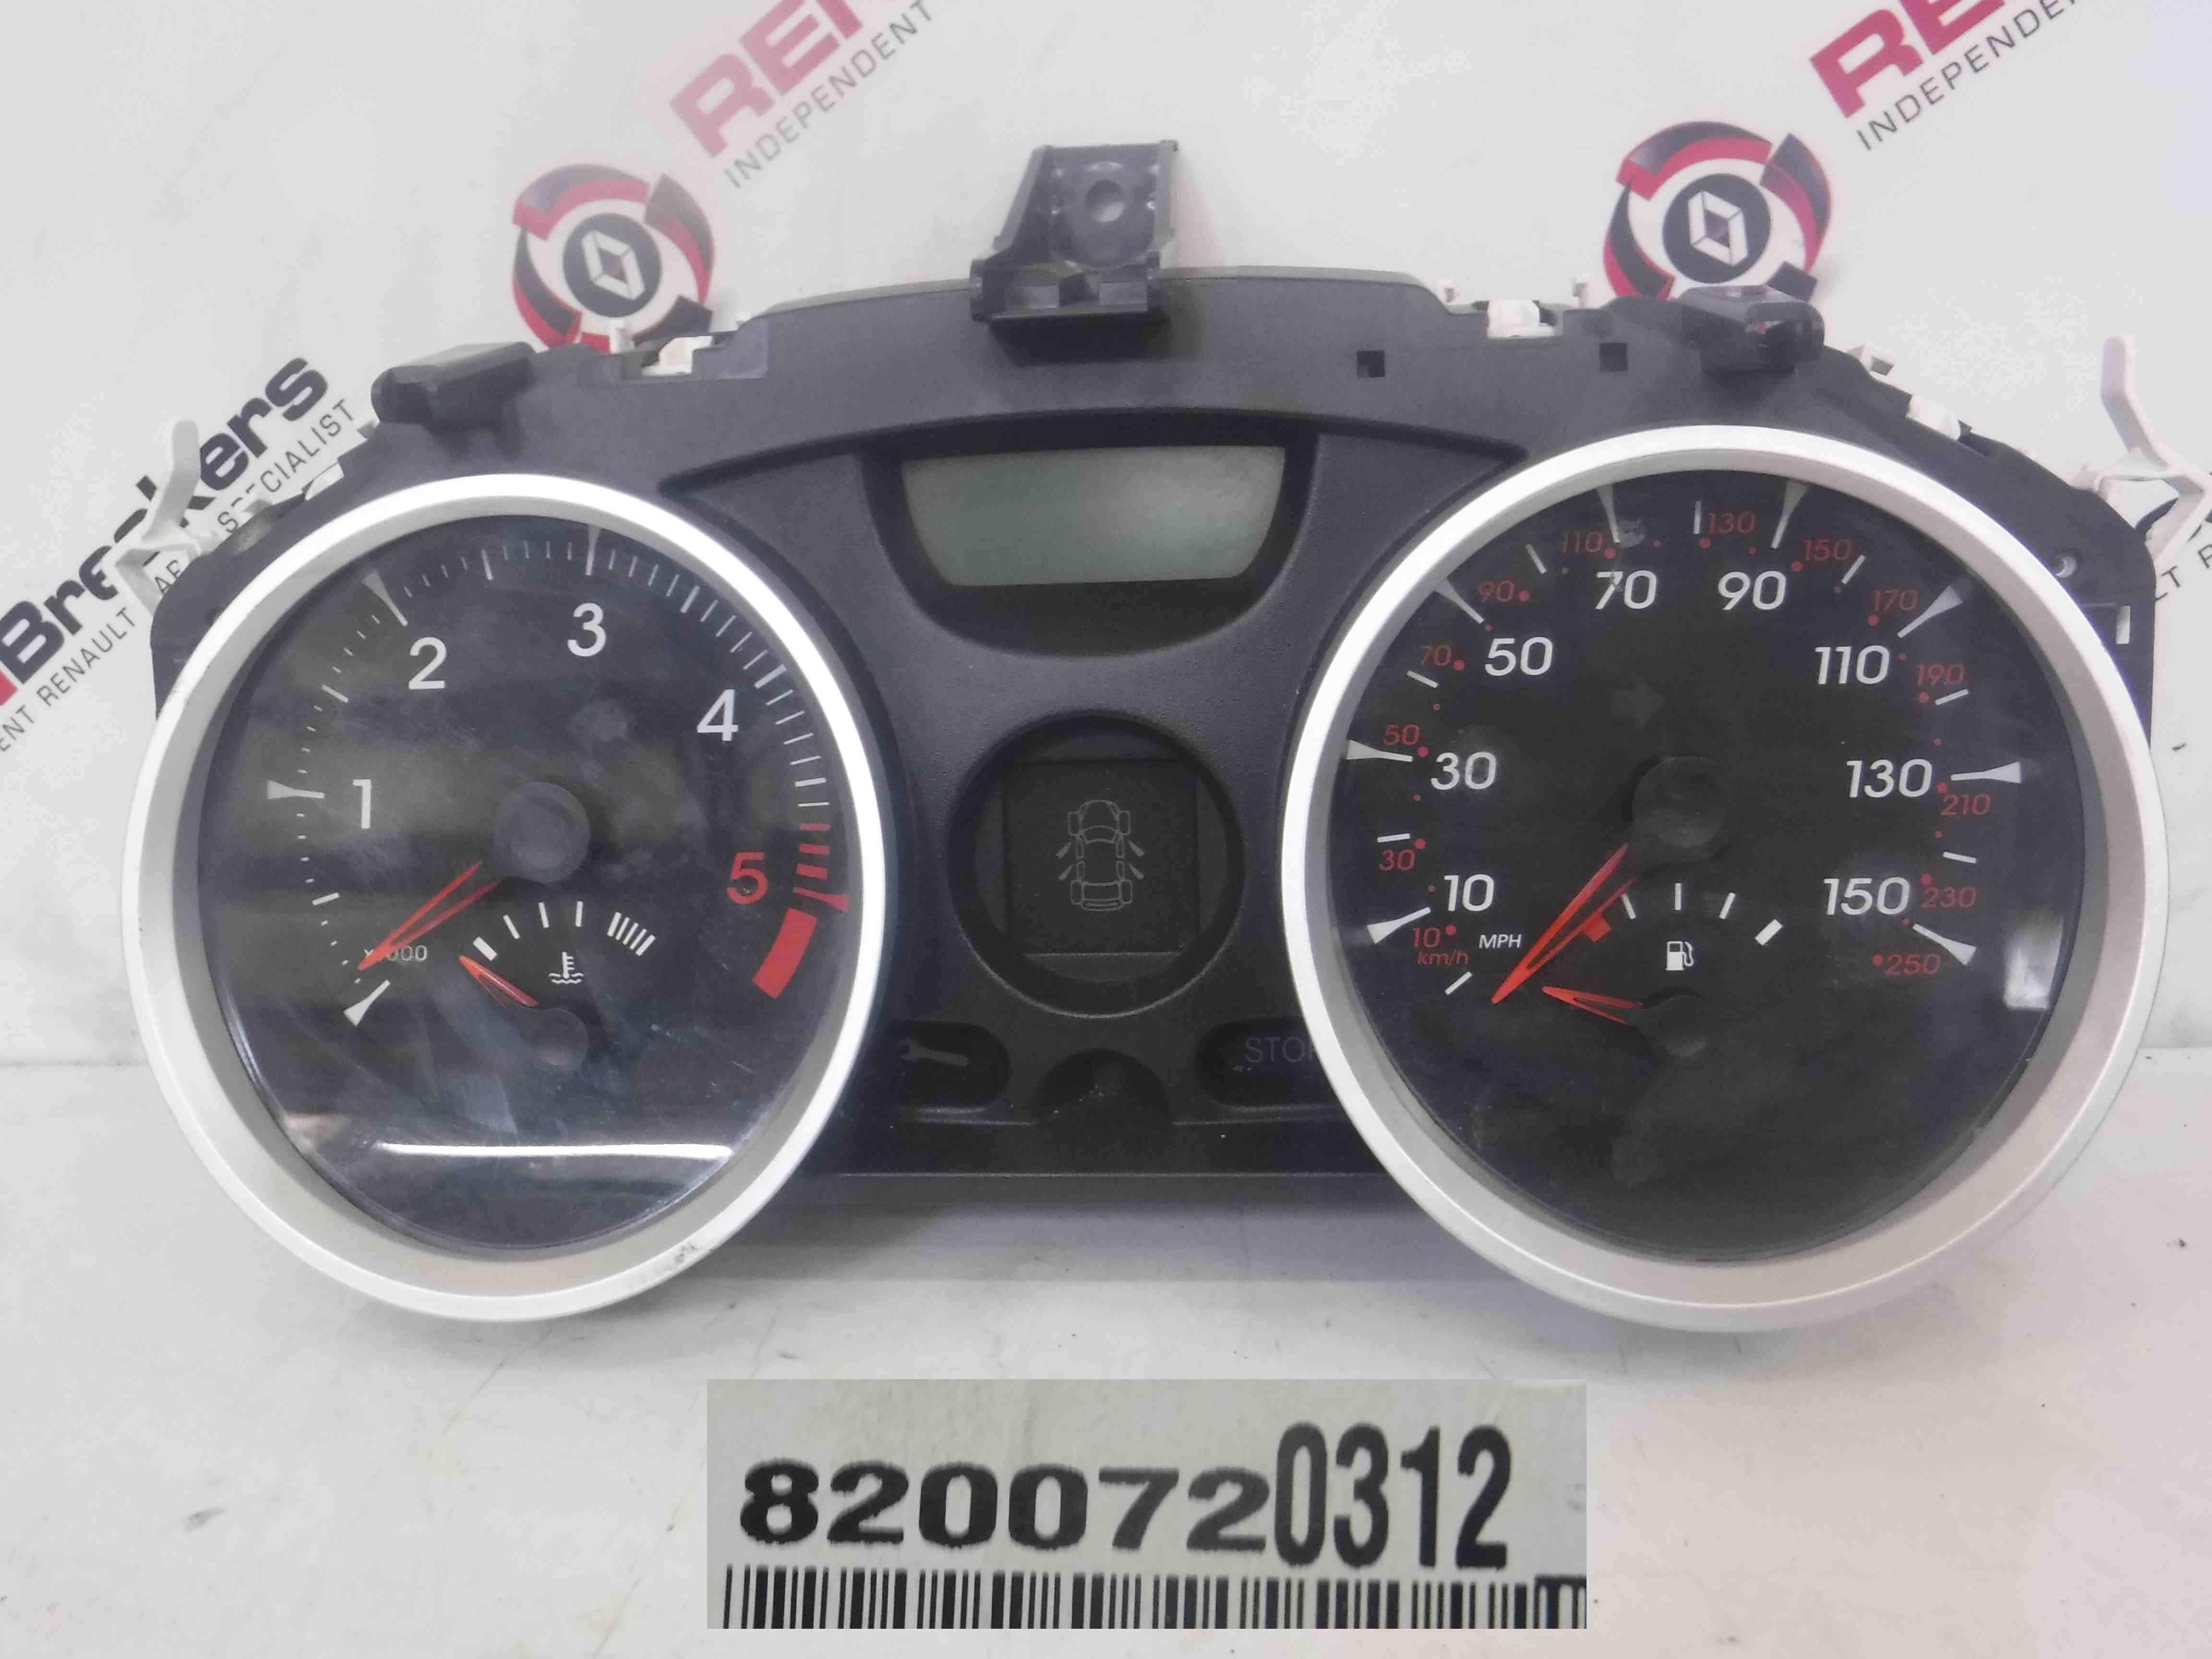 Renault Megane Sport 175 2002-2008 Instrument Panel Dials 8200720312